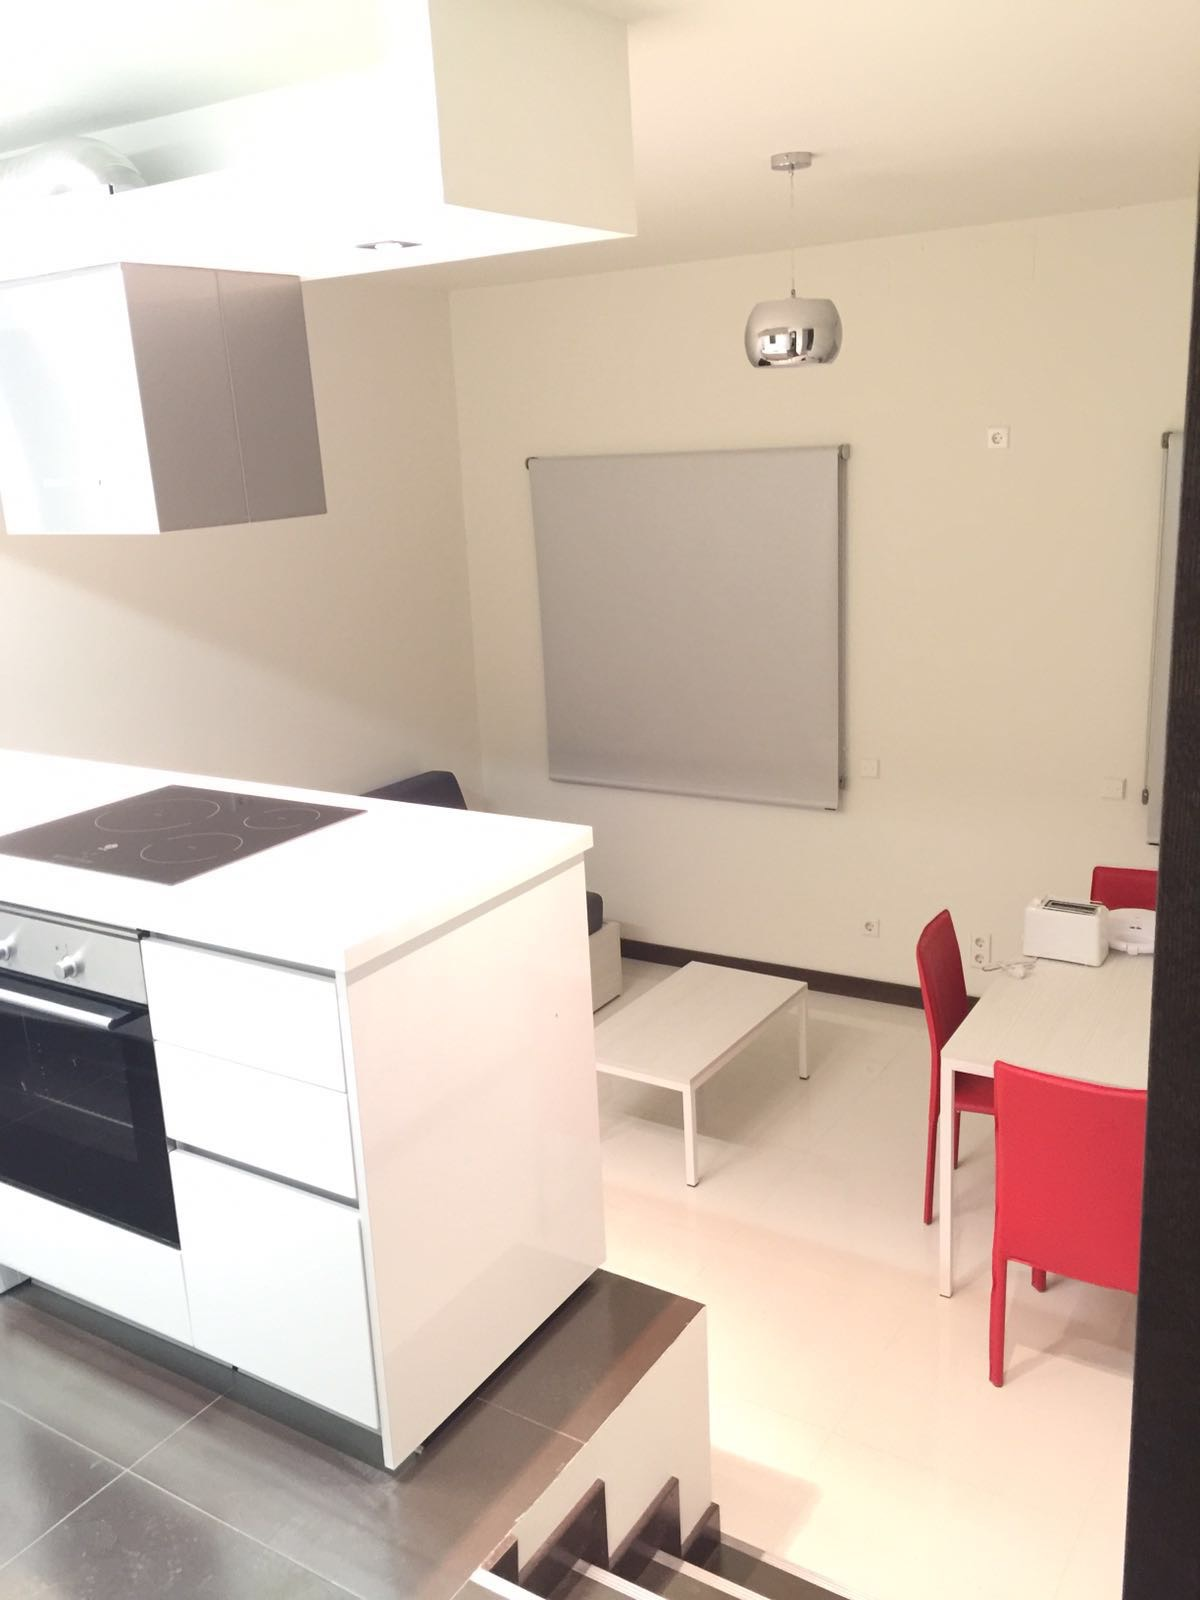 SUITES apartamento planta baja 4pax